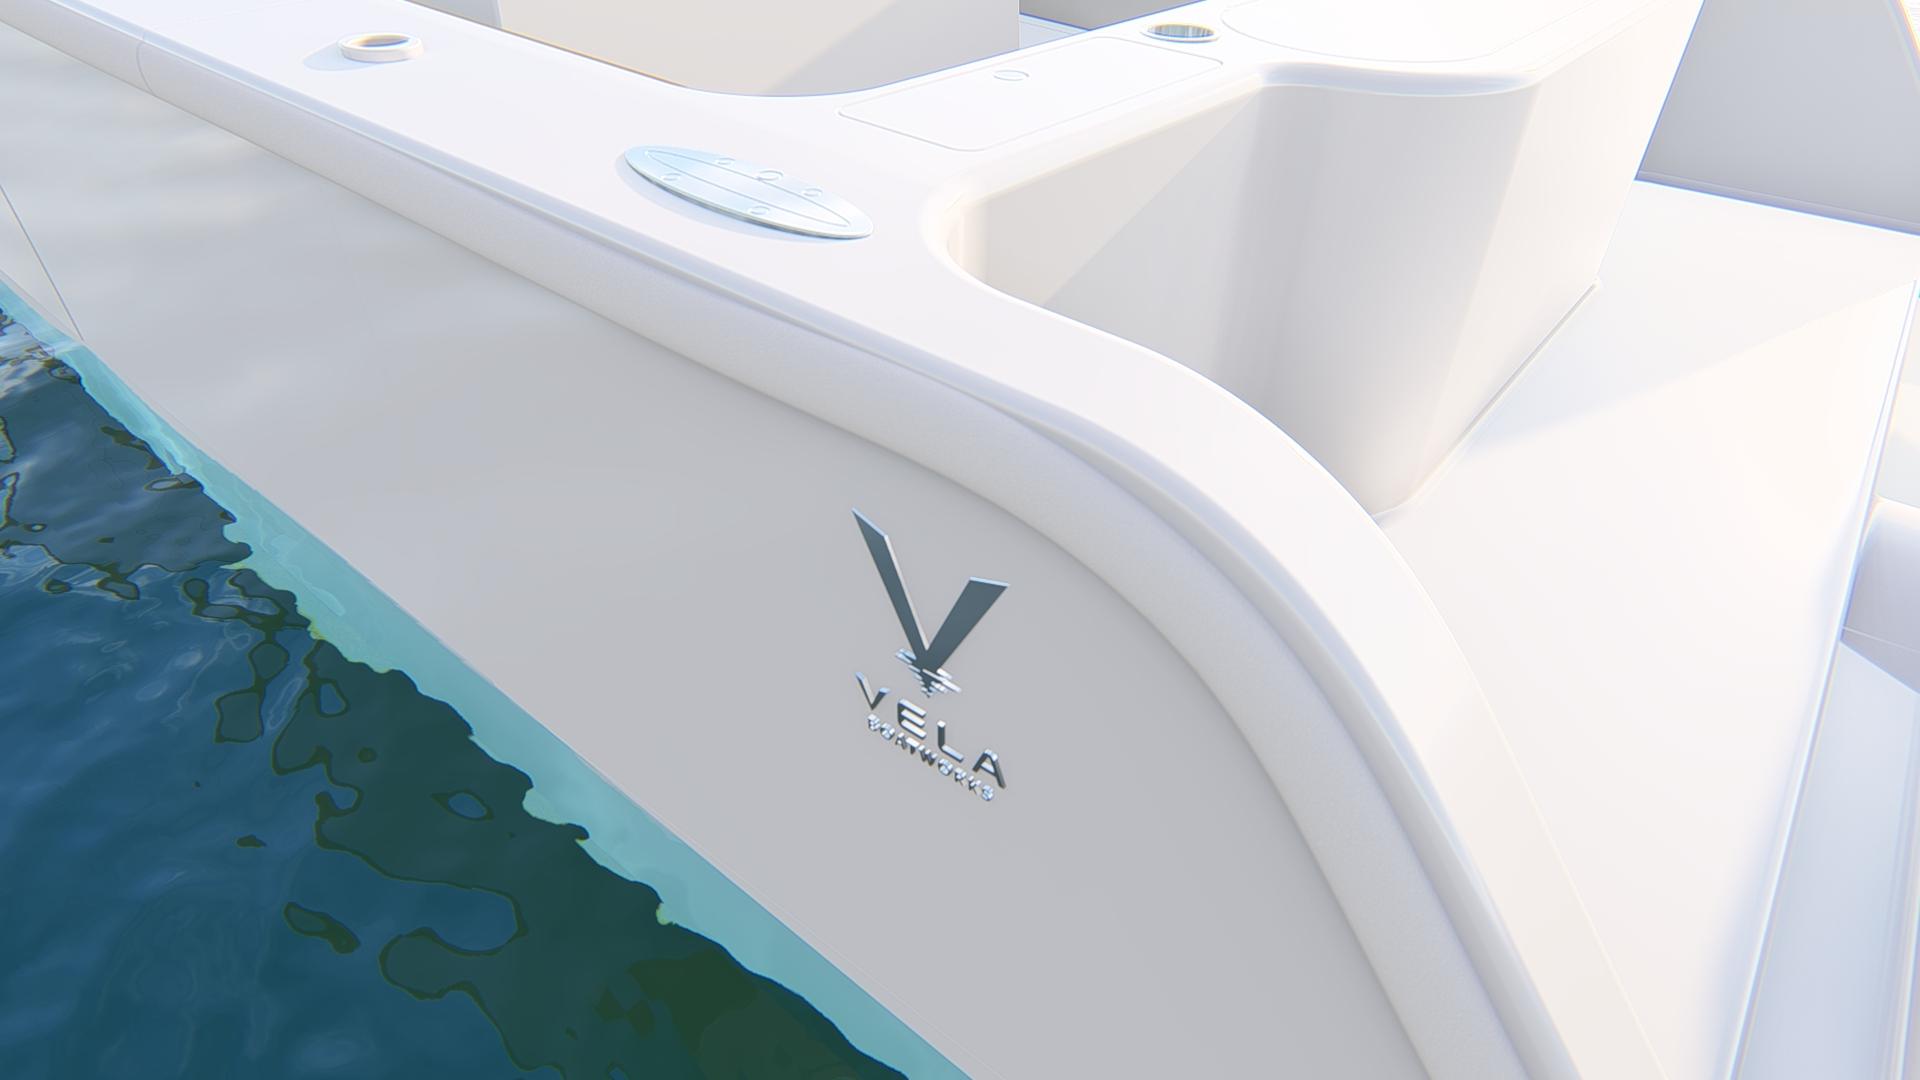 Vela Boatworks_12 - Photo.jpg